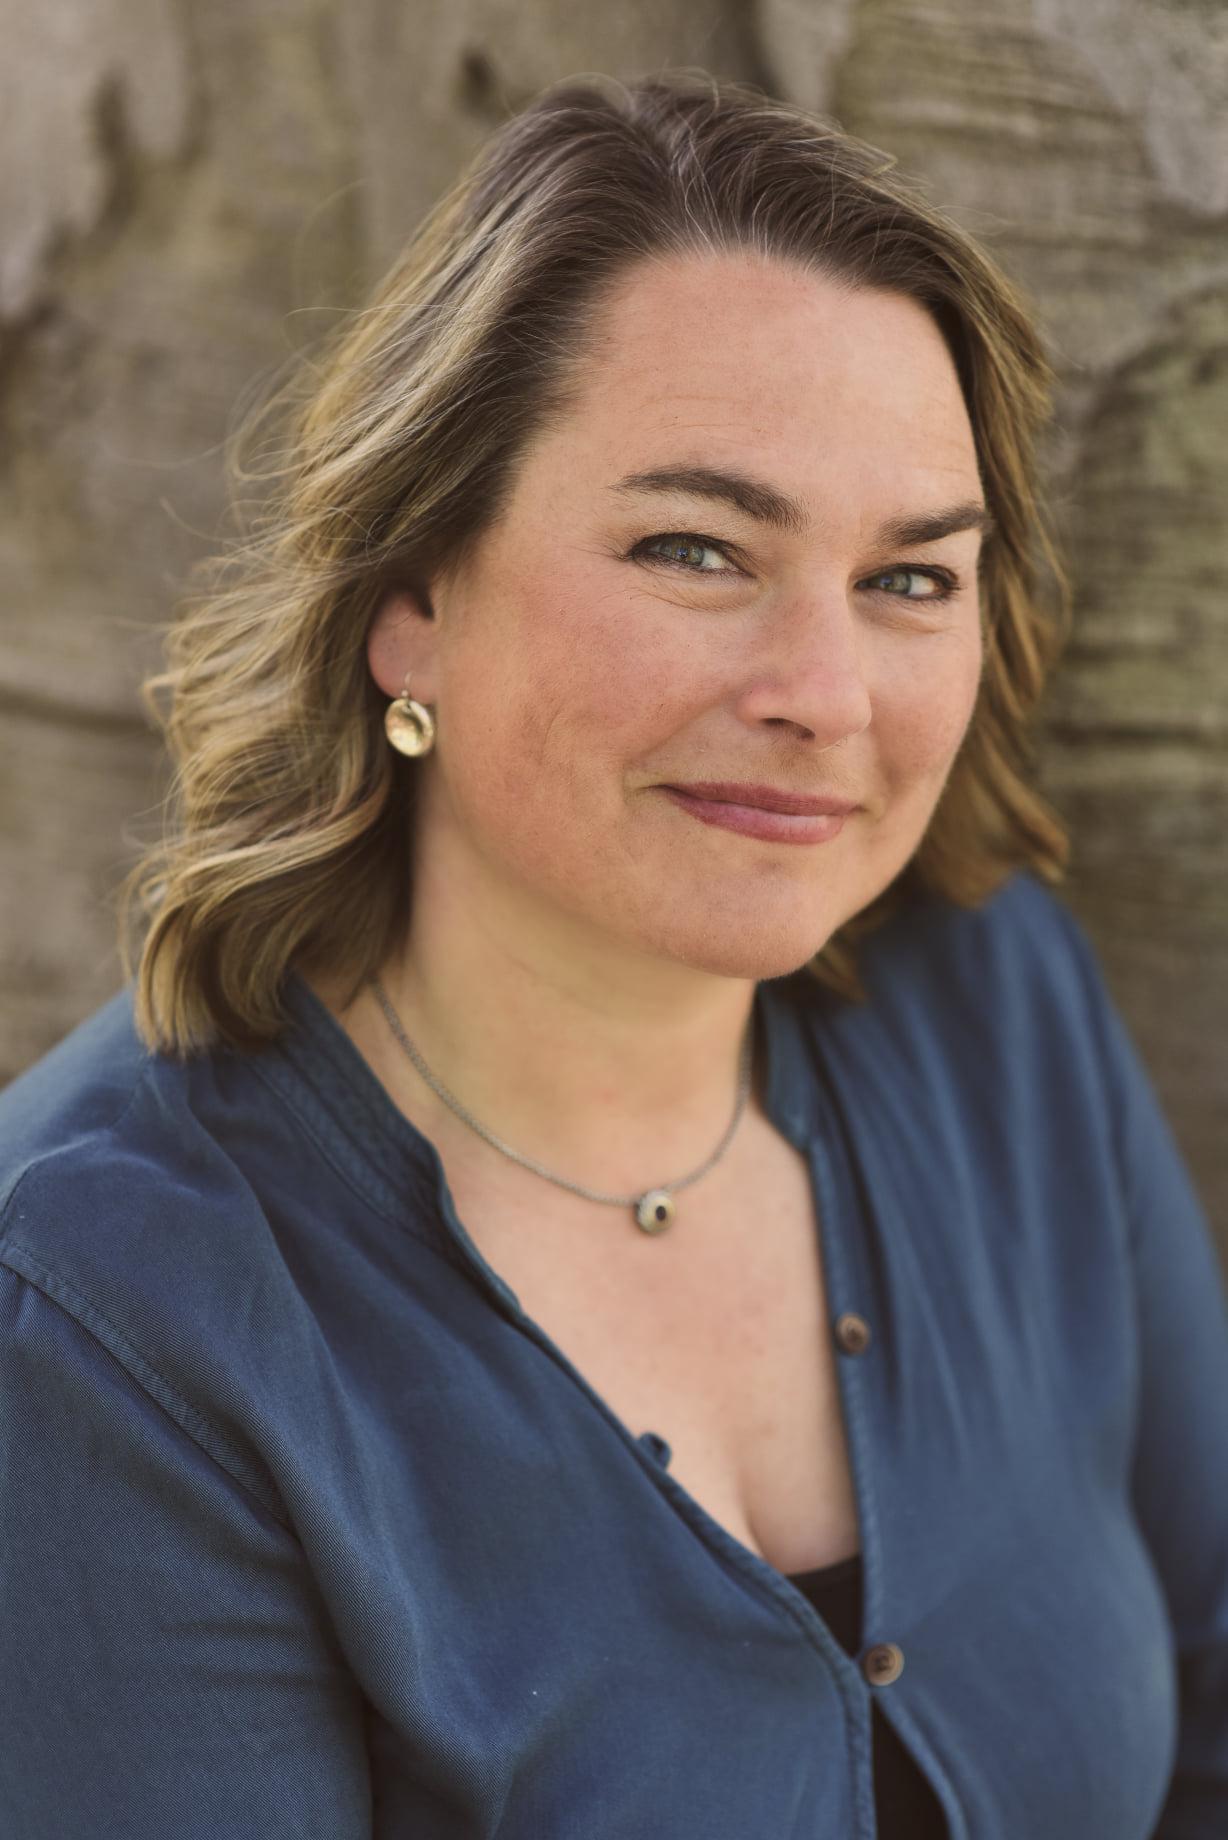 Las Vegas Intuitive Wellness Coach Dr. Dolores Fazzino